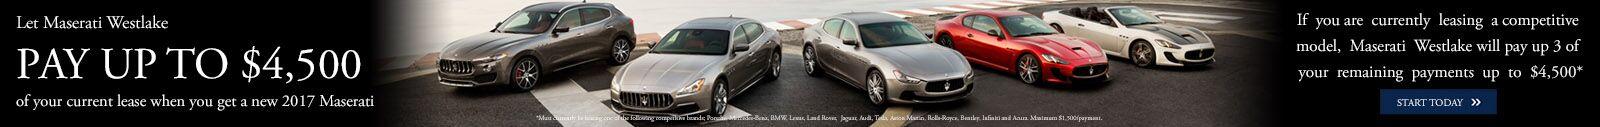 Maserati - $4,500